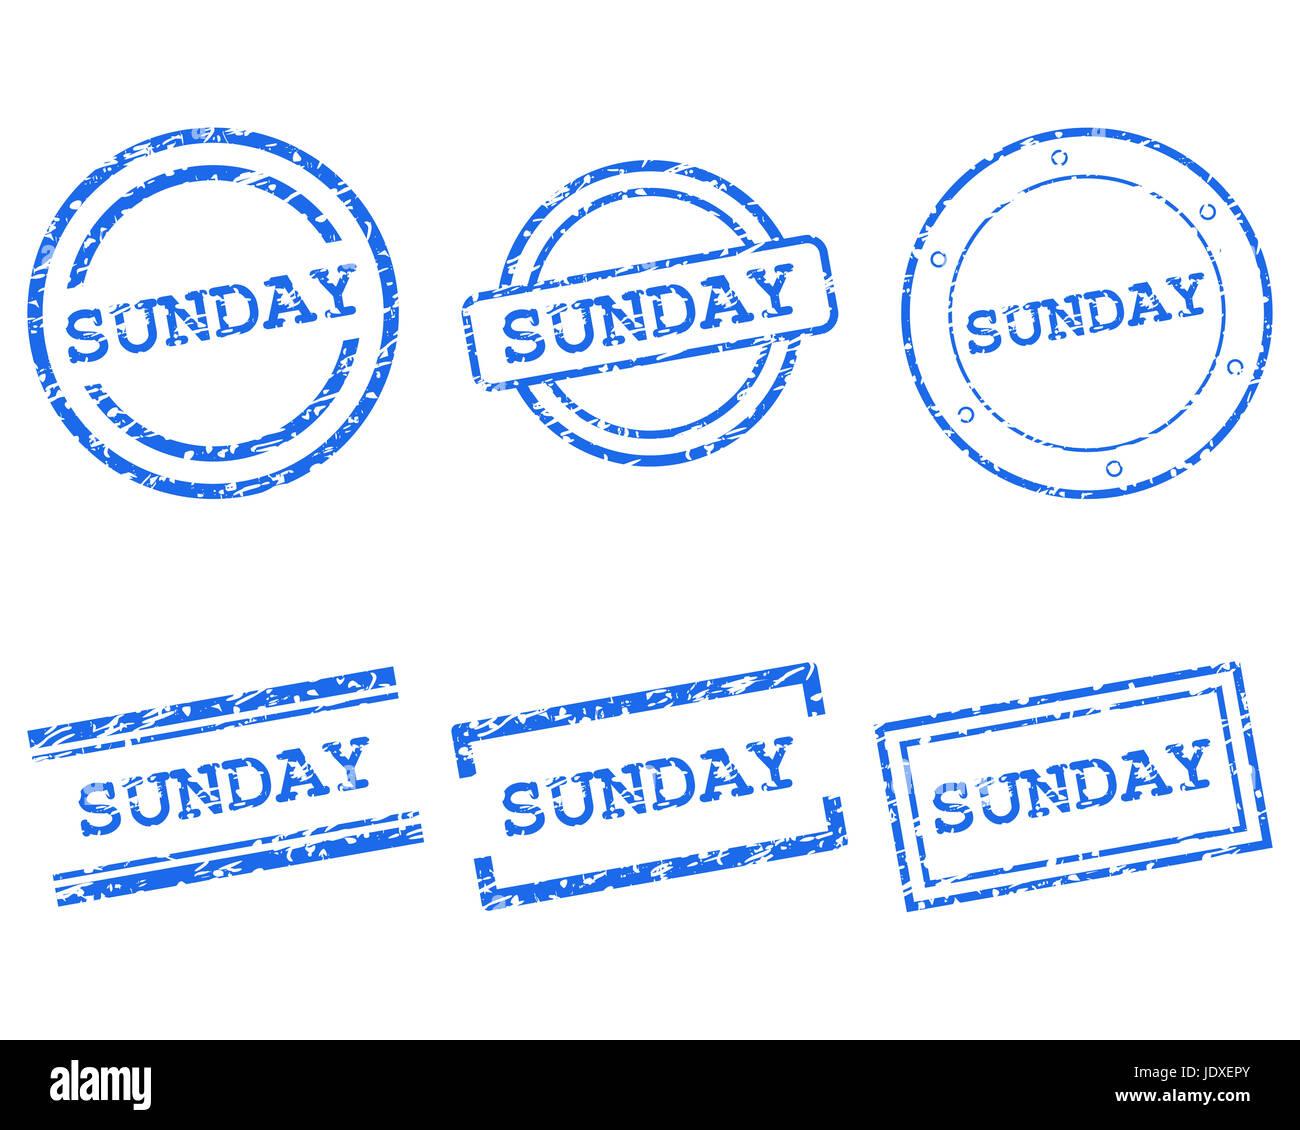 Sunday Stempel - Stock Image